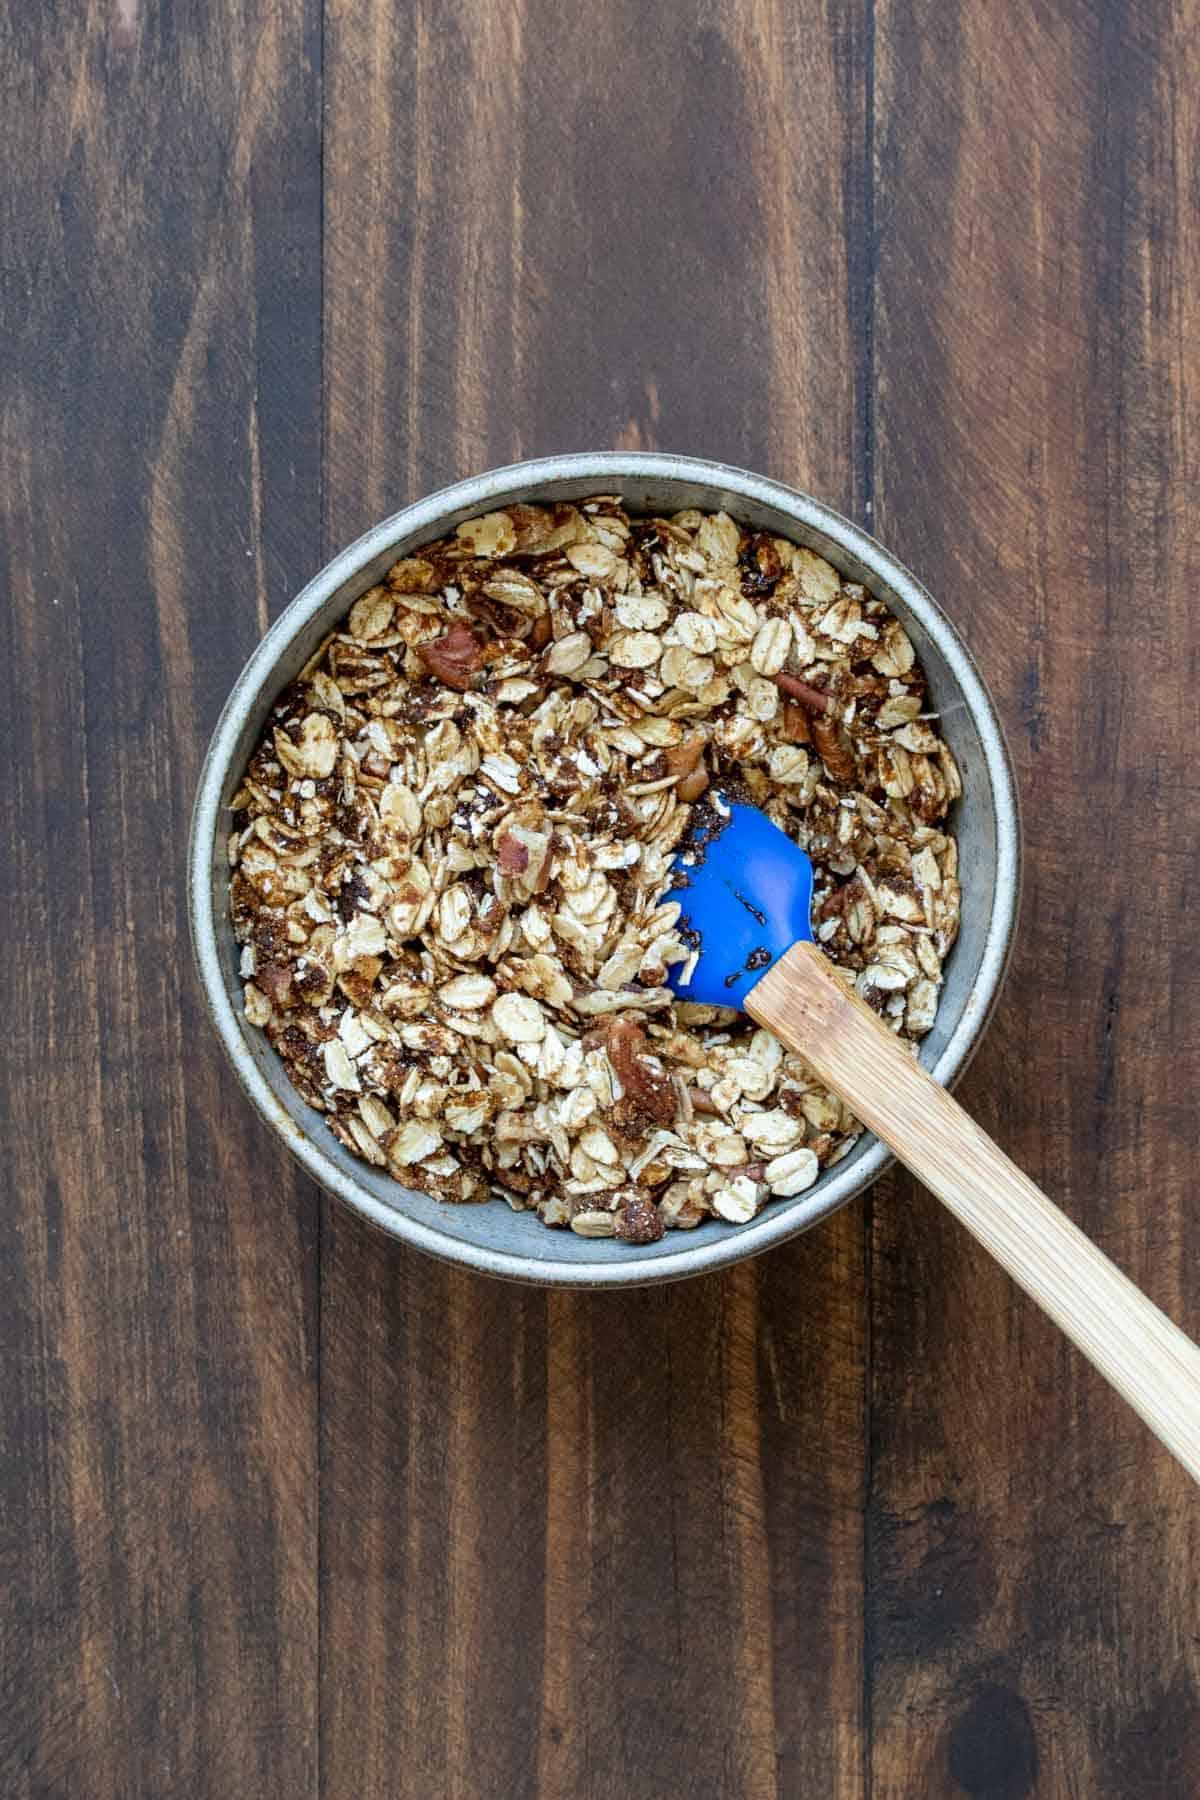 Spatula mixing oats, nuts and sugar in a grey bowl